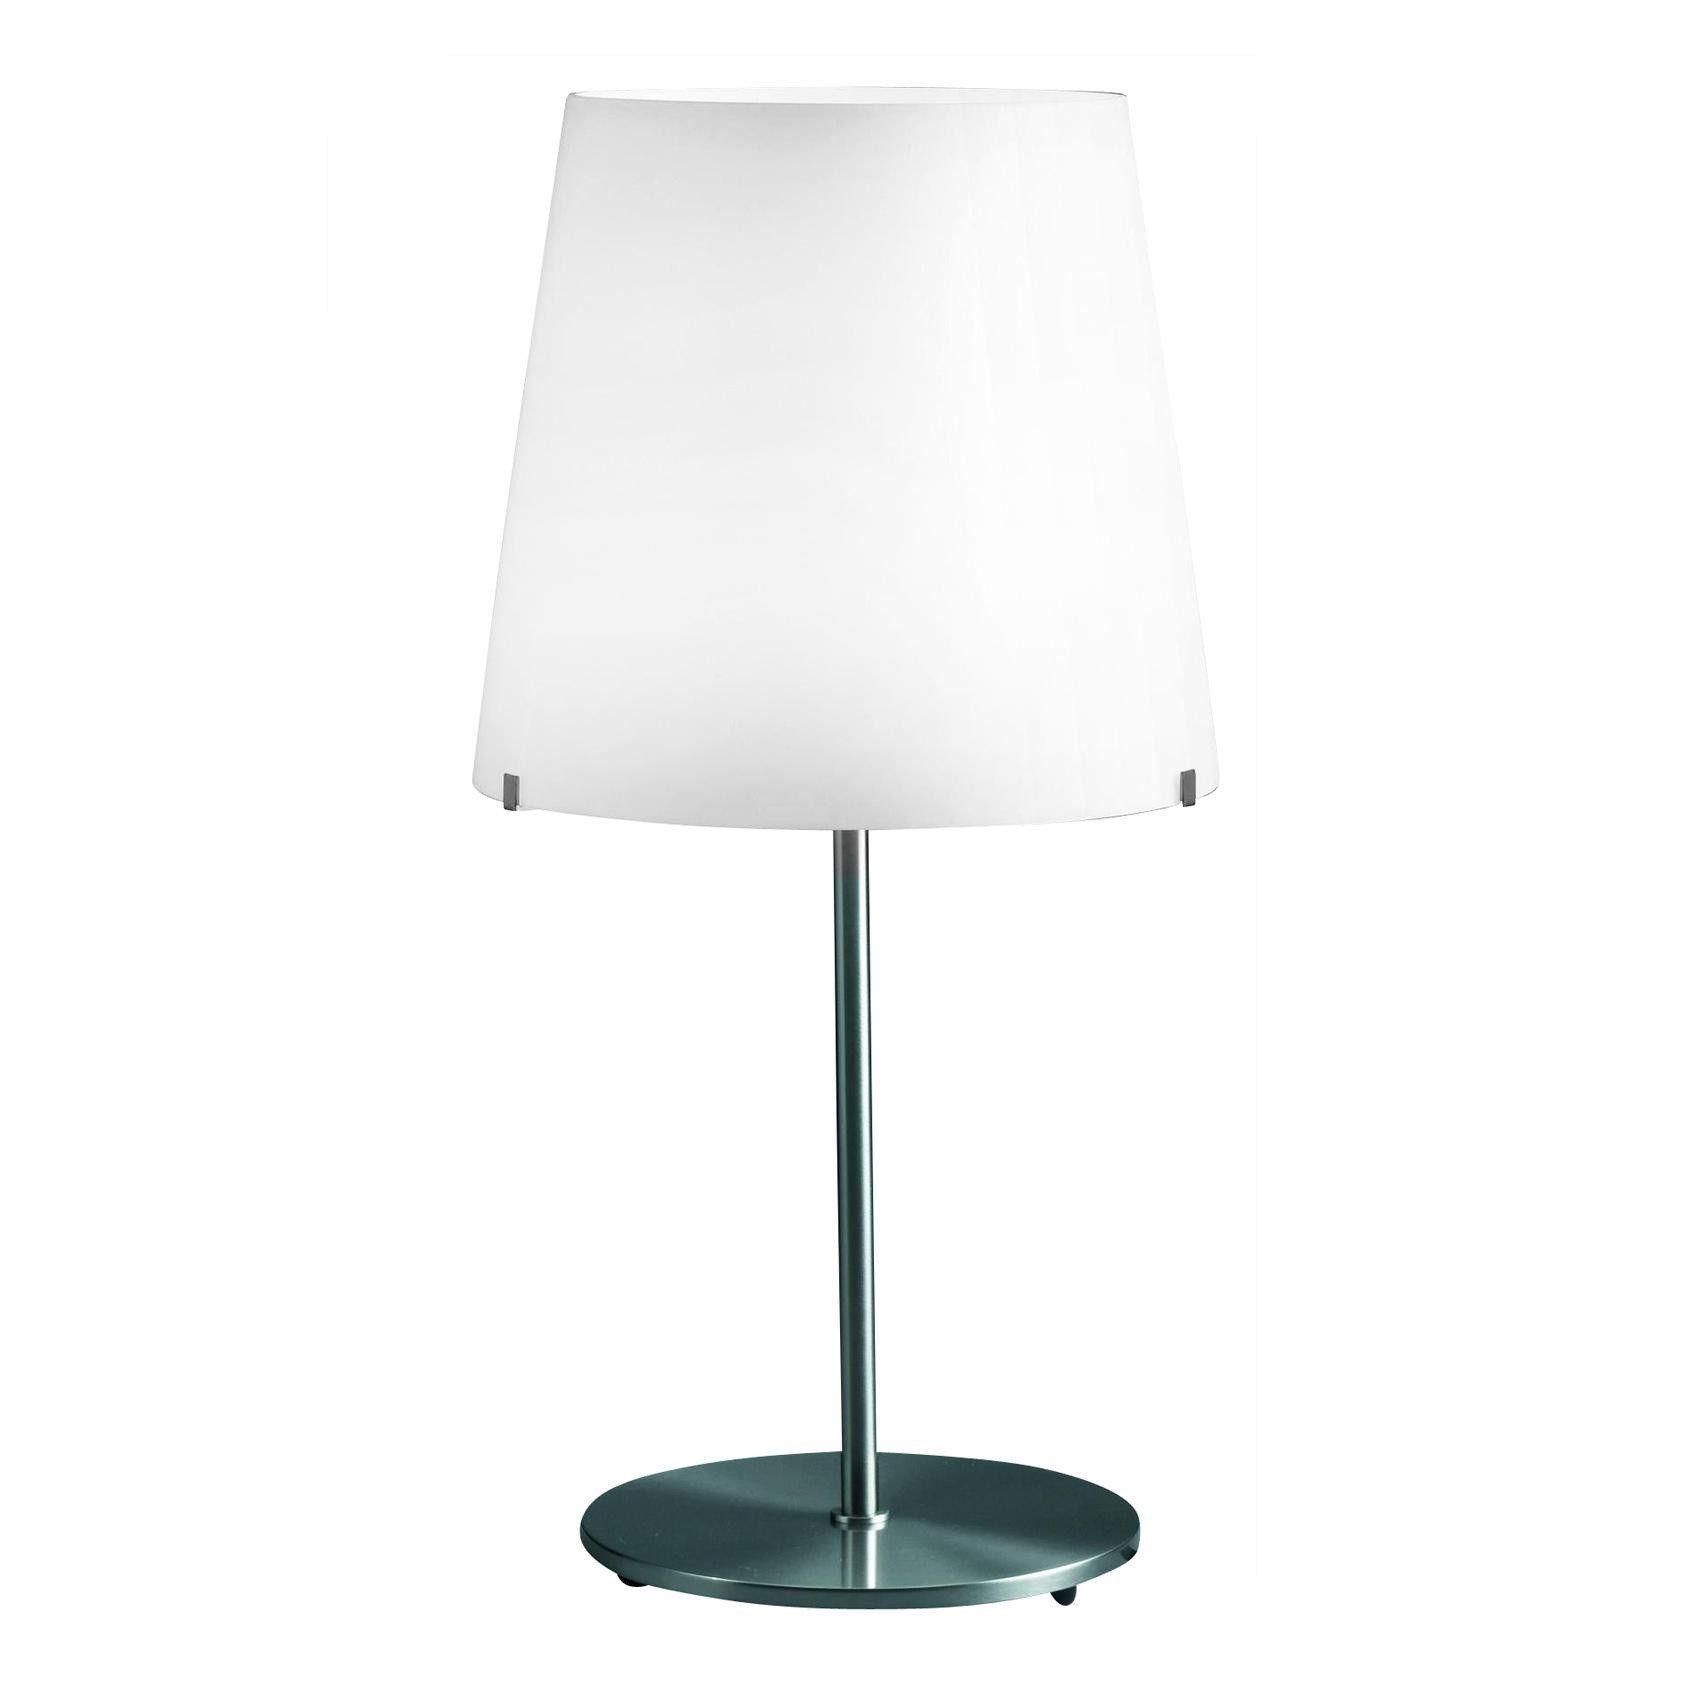 3247ta lampe de table fontana arte. Black Bedroom Furniture Sets. Home Design Ideas